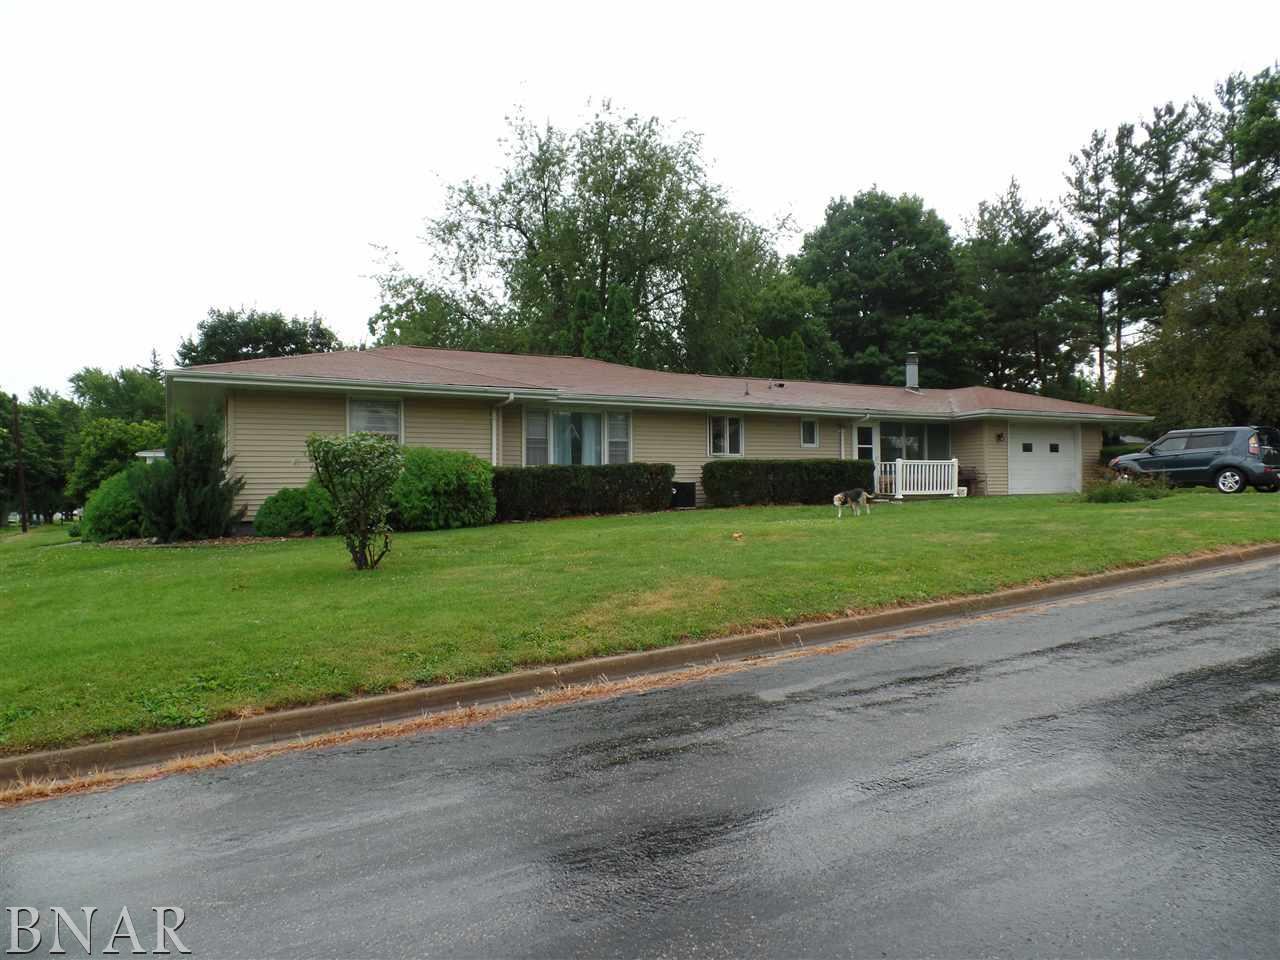 406 N Center St, Colfax, IL 61728